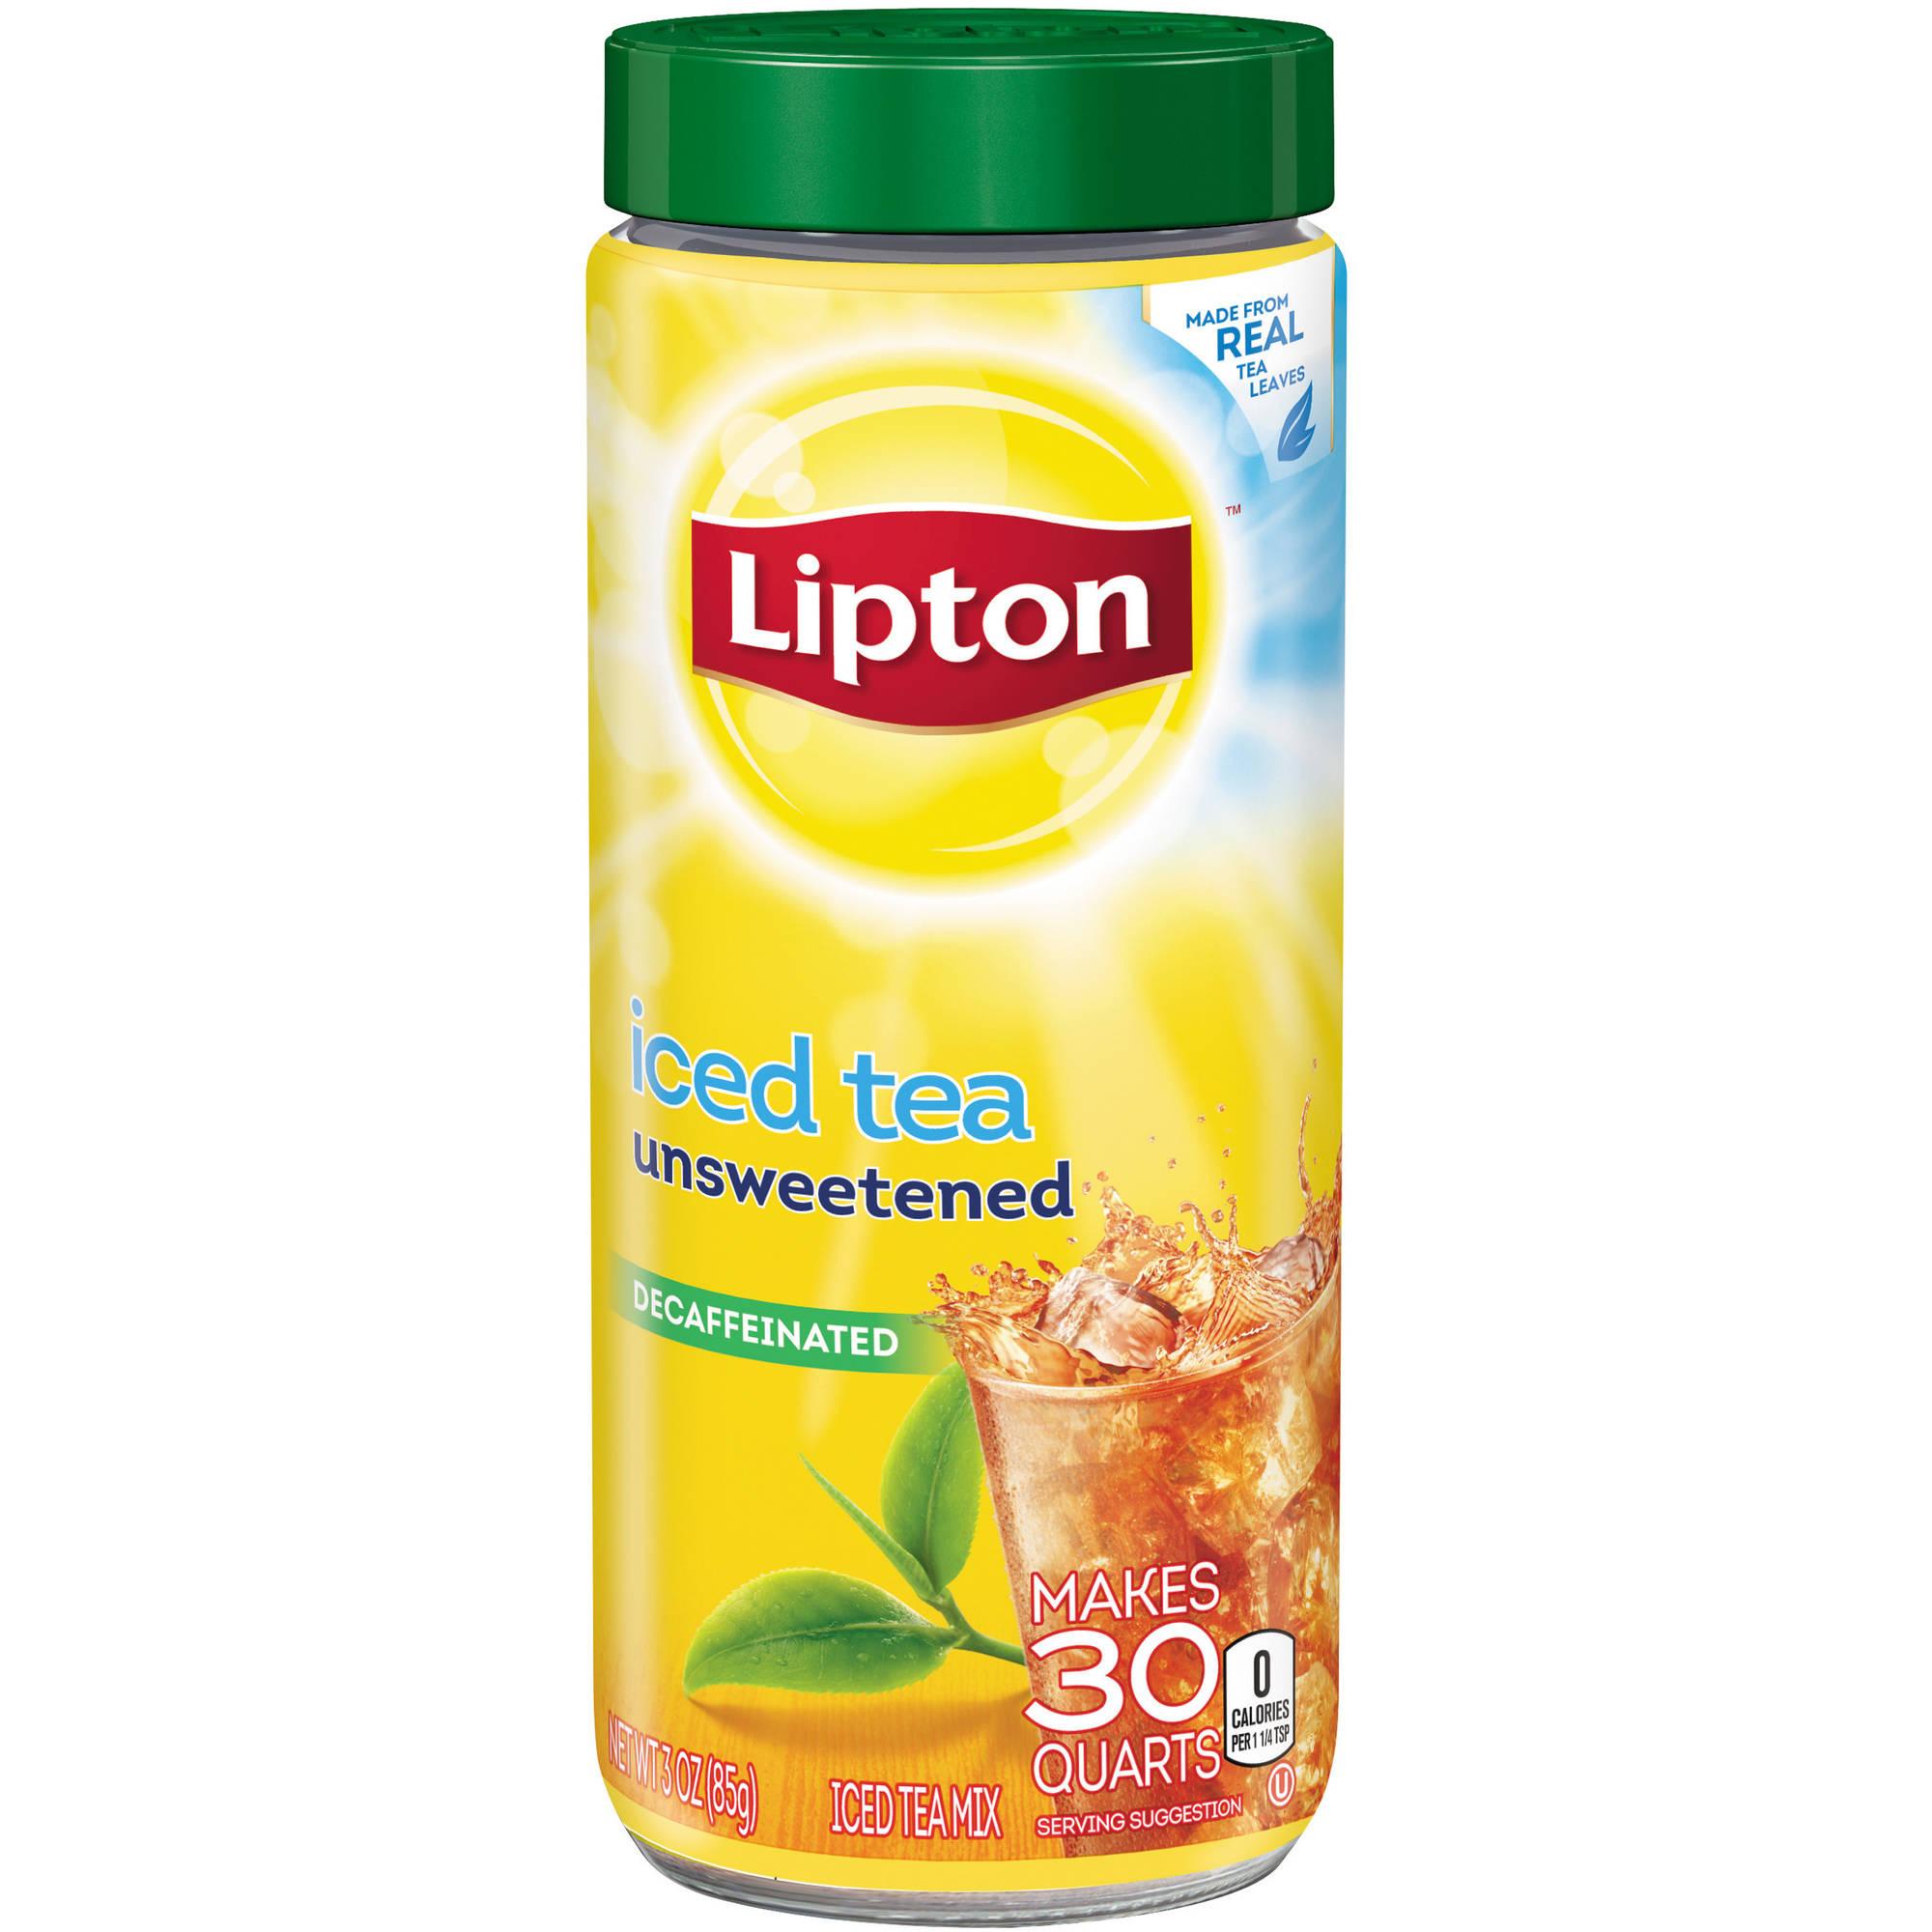 Lipton Decaffeinated Unsweetened Iced Tea Mix, 30 qt